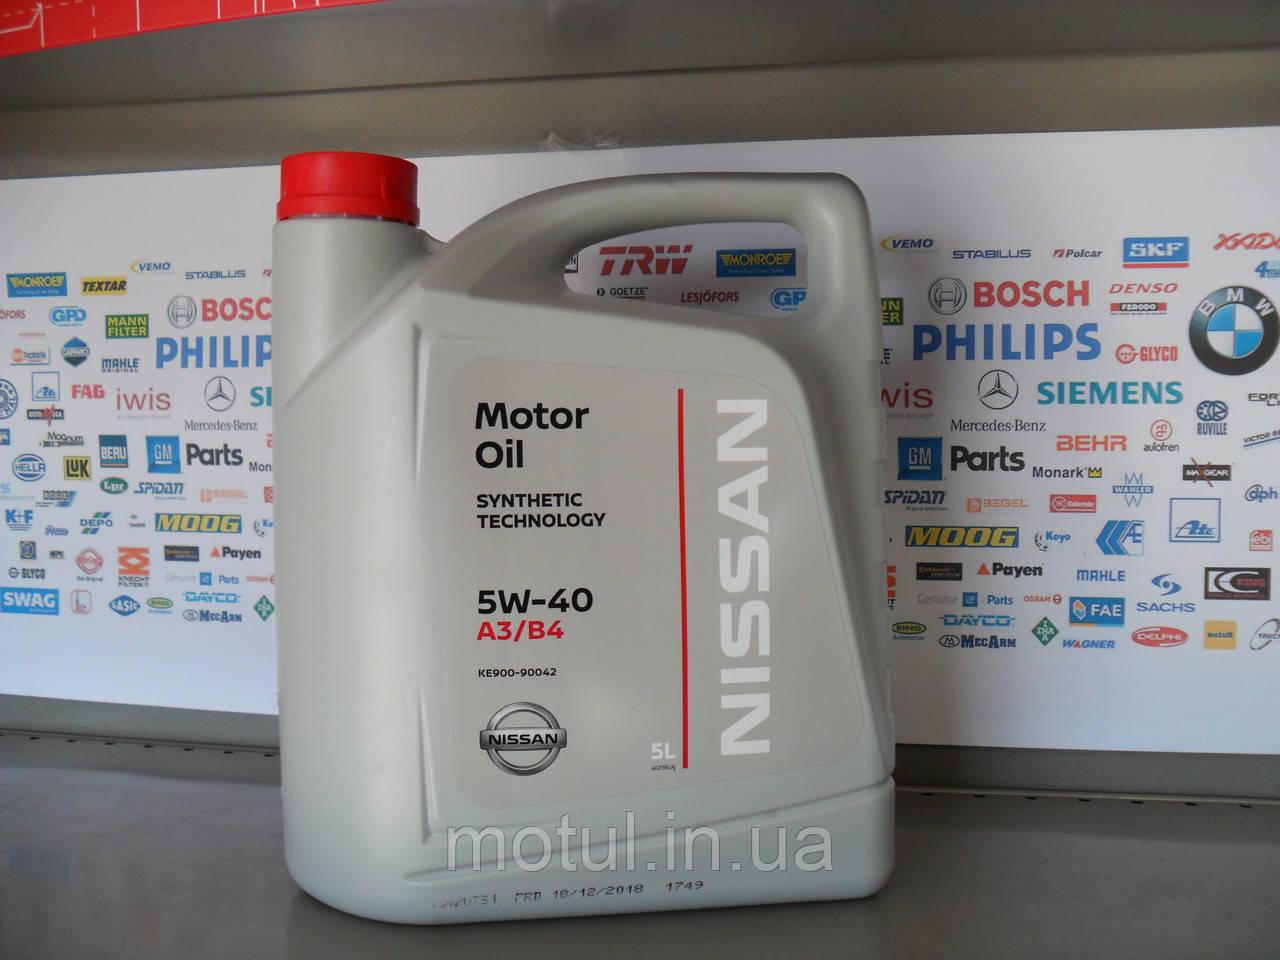 Моторне масло Nissan 5w40 5L